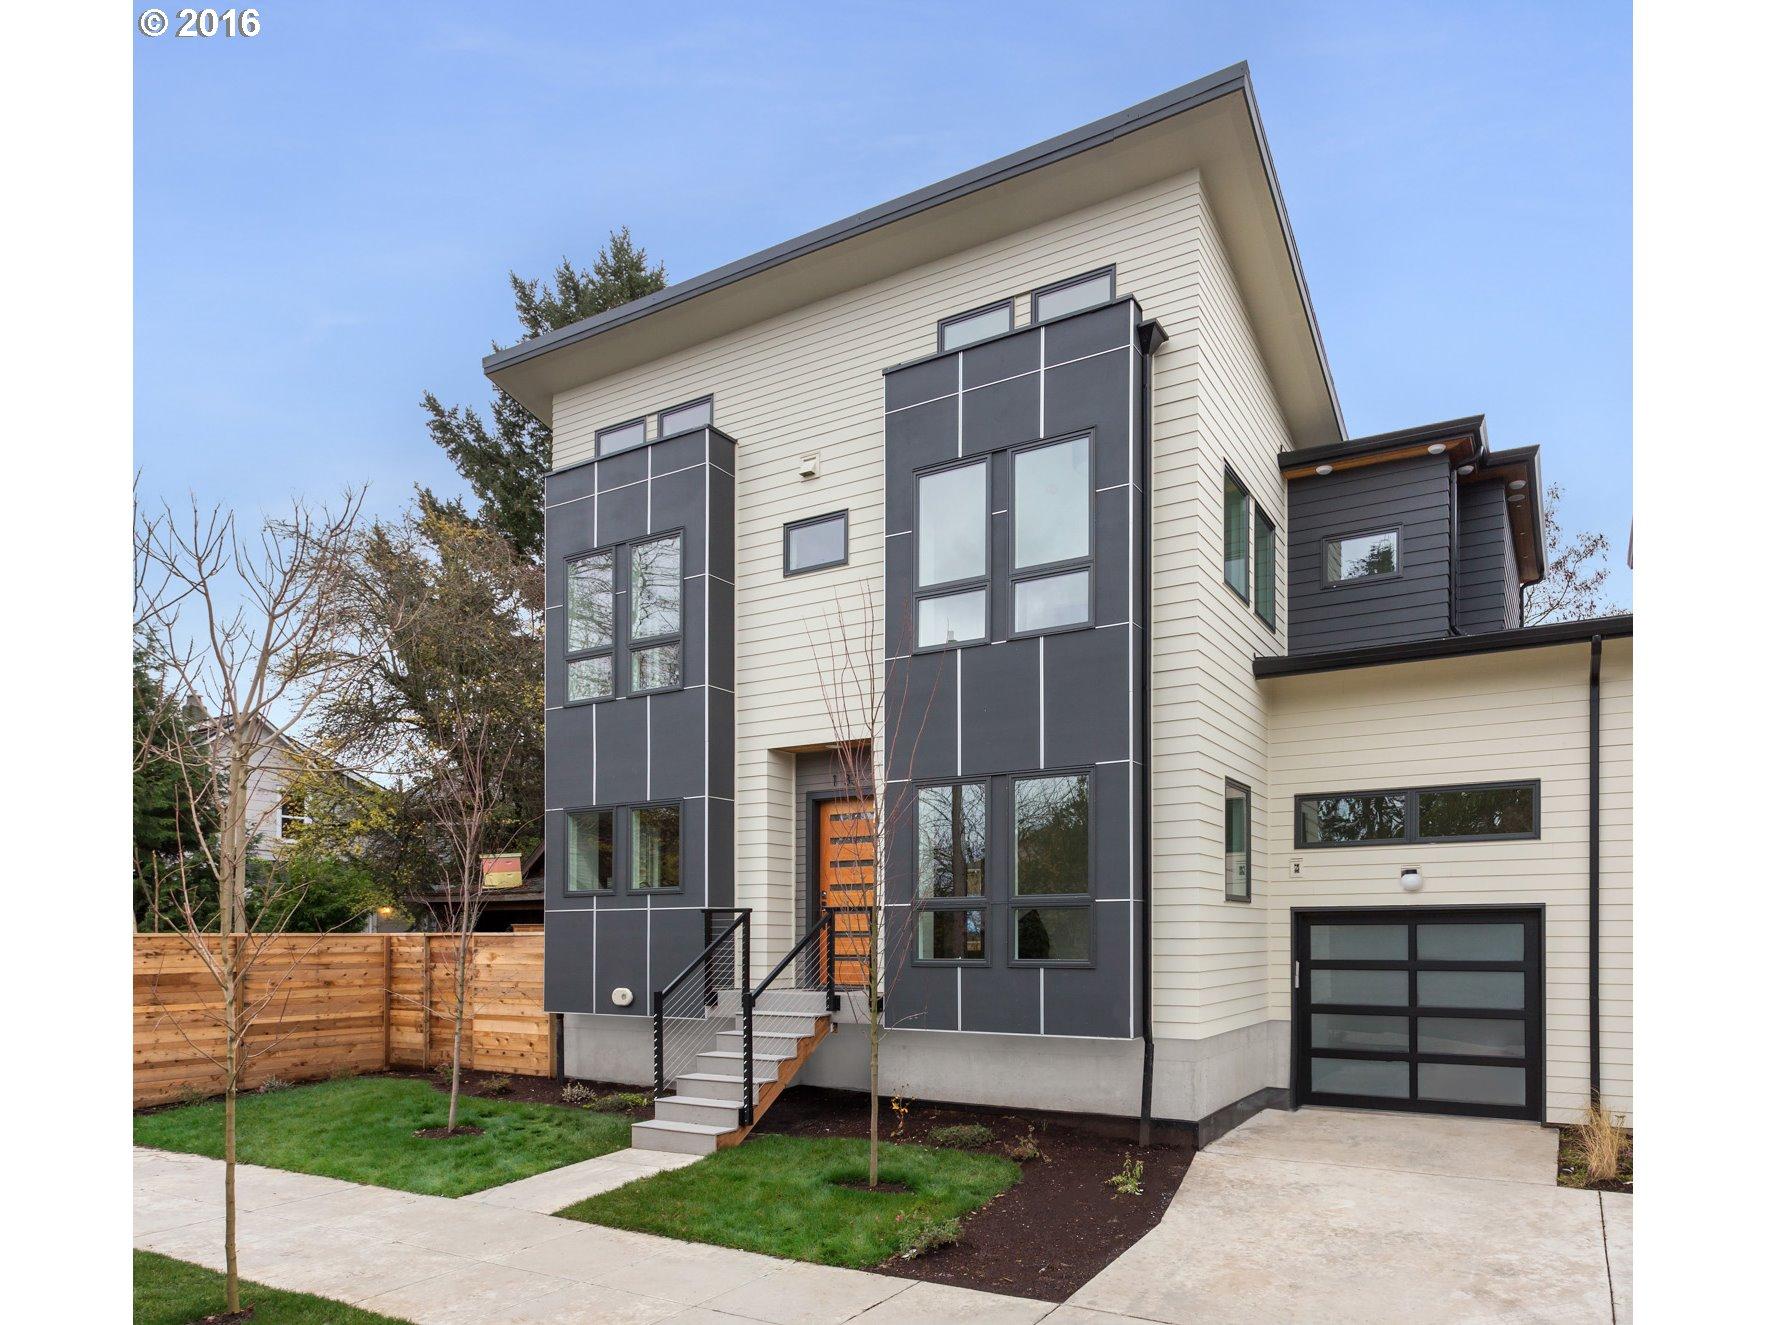 Property for sale at 1633 NE WYGANT ST, Portland,  OR 97211